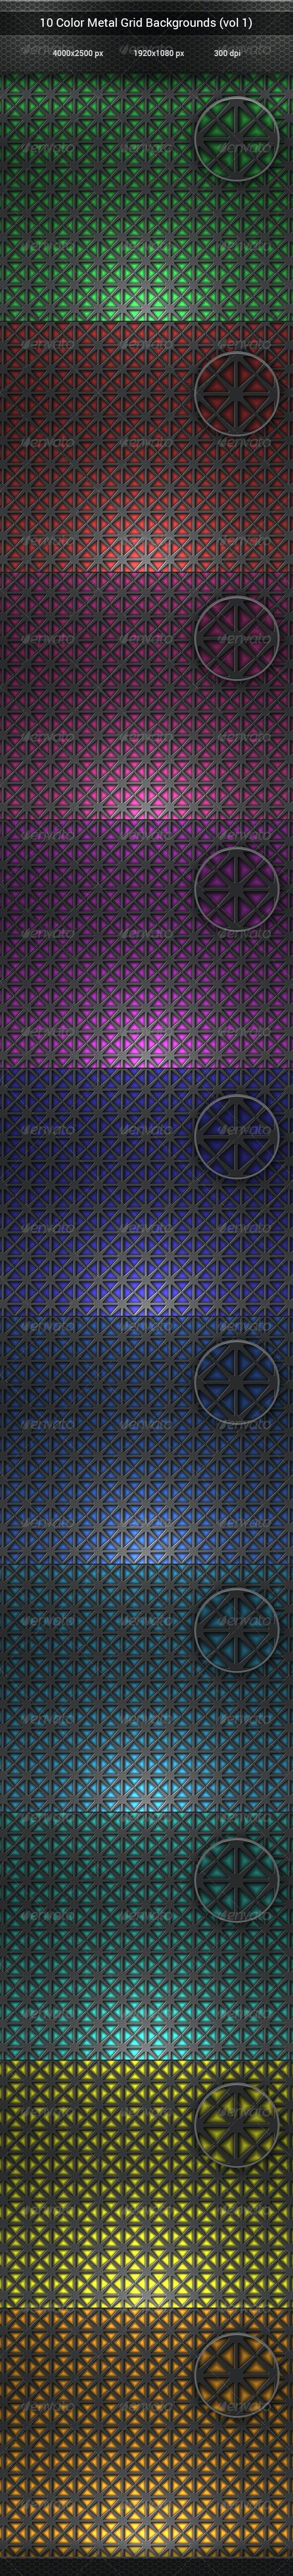 10 Color Metal Grid Backgrounds (vol 1) - Backgrounds Graphics